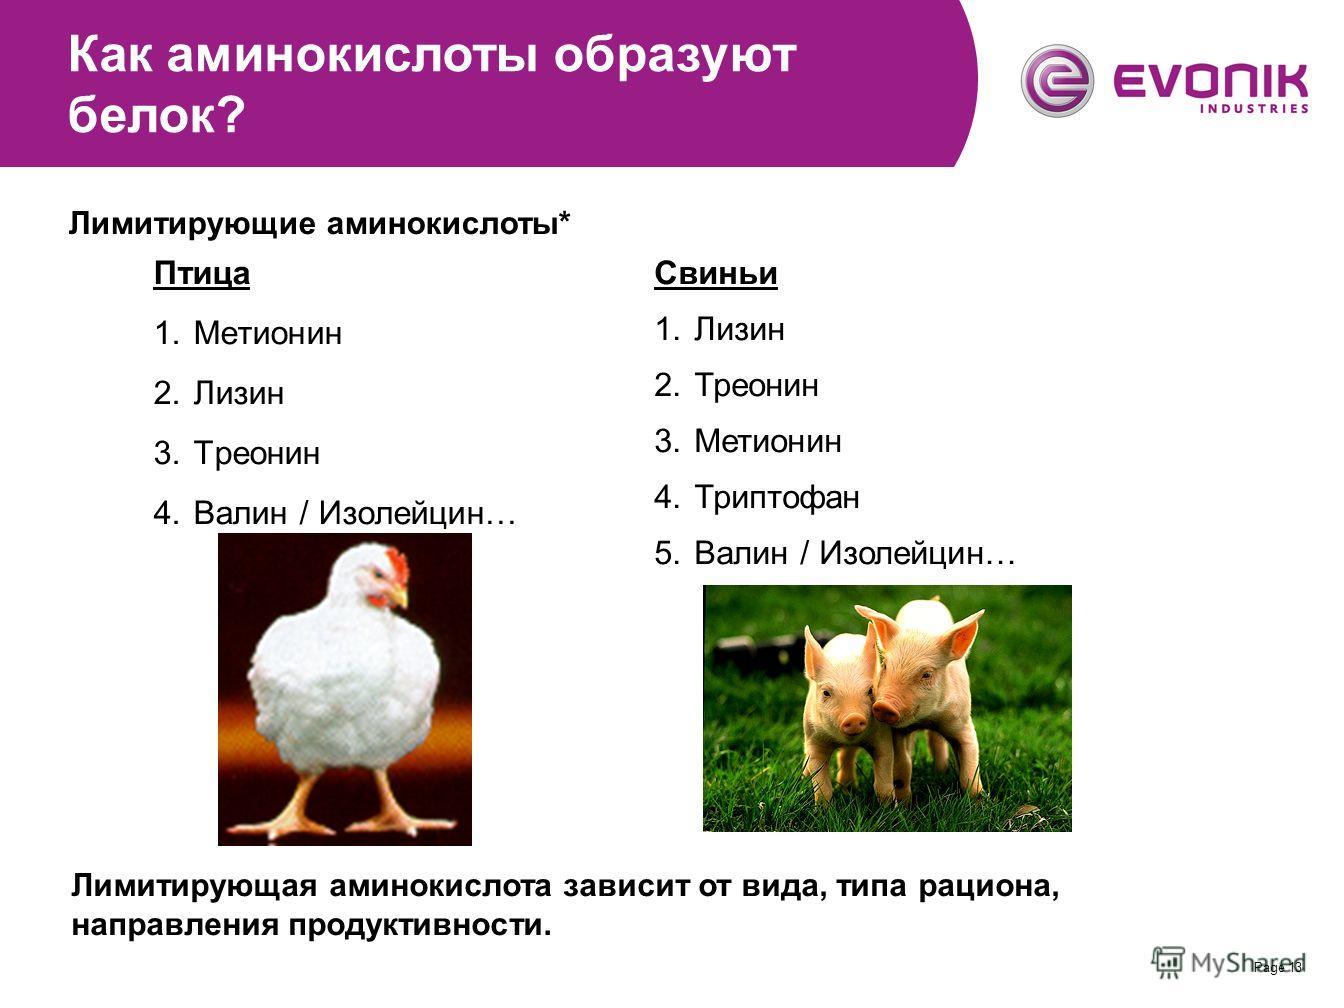 Page 13 Птица 1.Метионин 2.Лизин 3.Треонин 4. Валин / Изолейцин… Свиньи 1.Лизин 2.Треонин 3.Метионин 4.Триптофан 5.Валин / Изолейцин… Как аминокислоты образуют белок? Лимитирующие аминокислоты* Лимитирующая аминокислота зависит от вида, типа рациона,